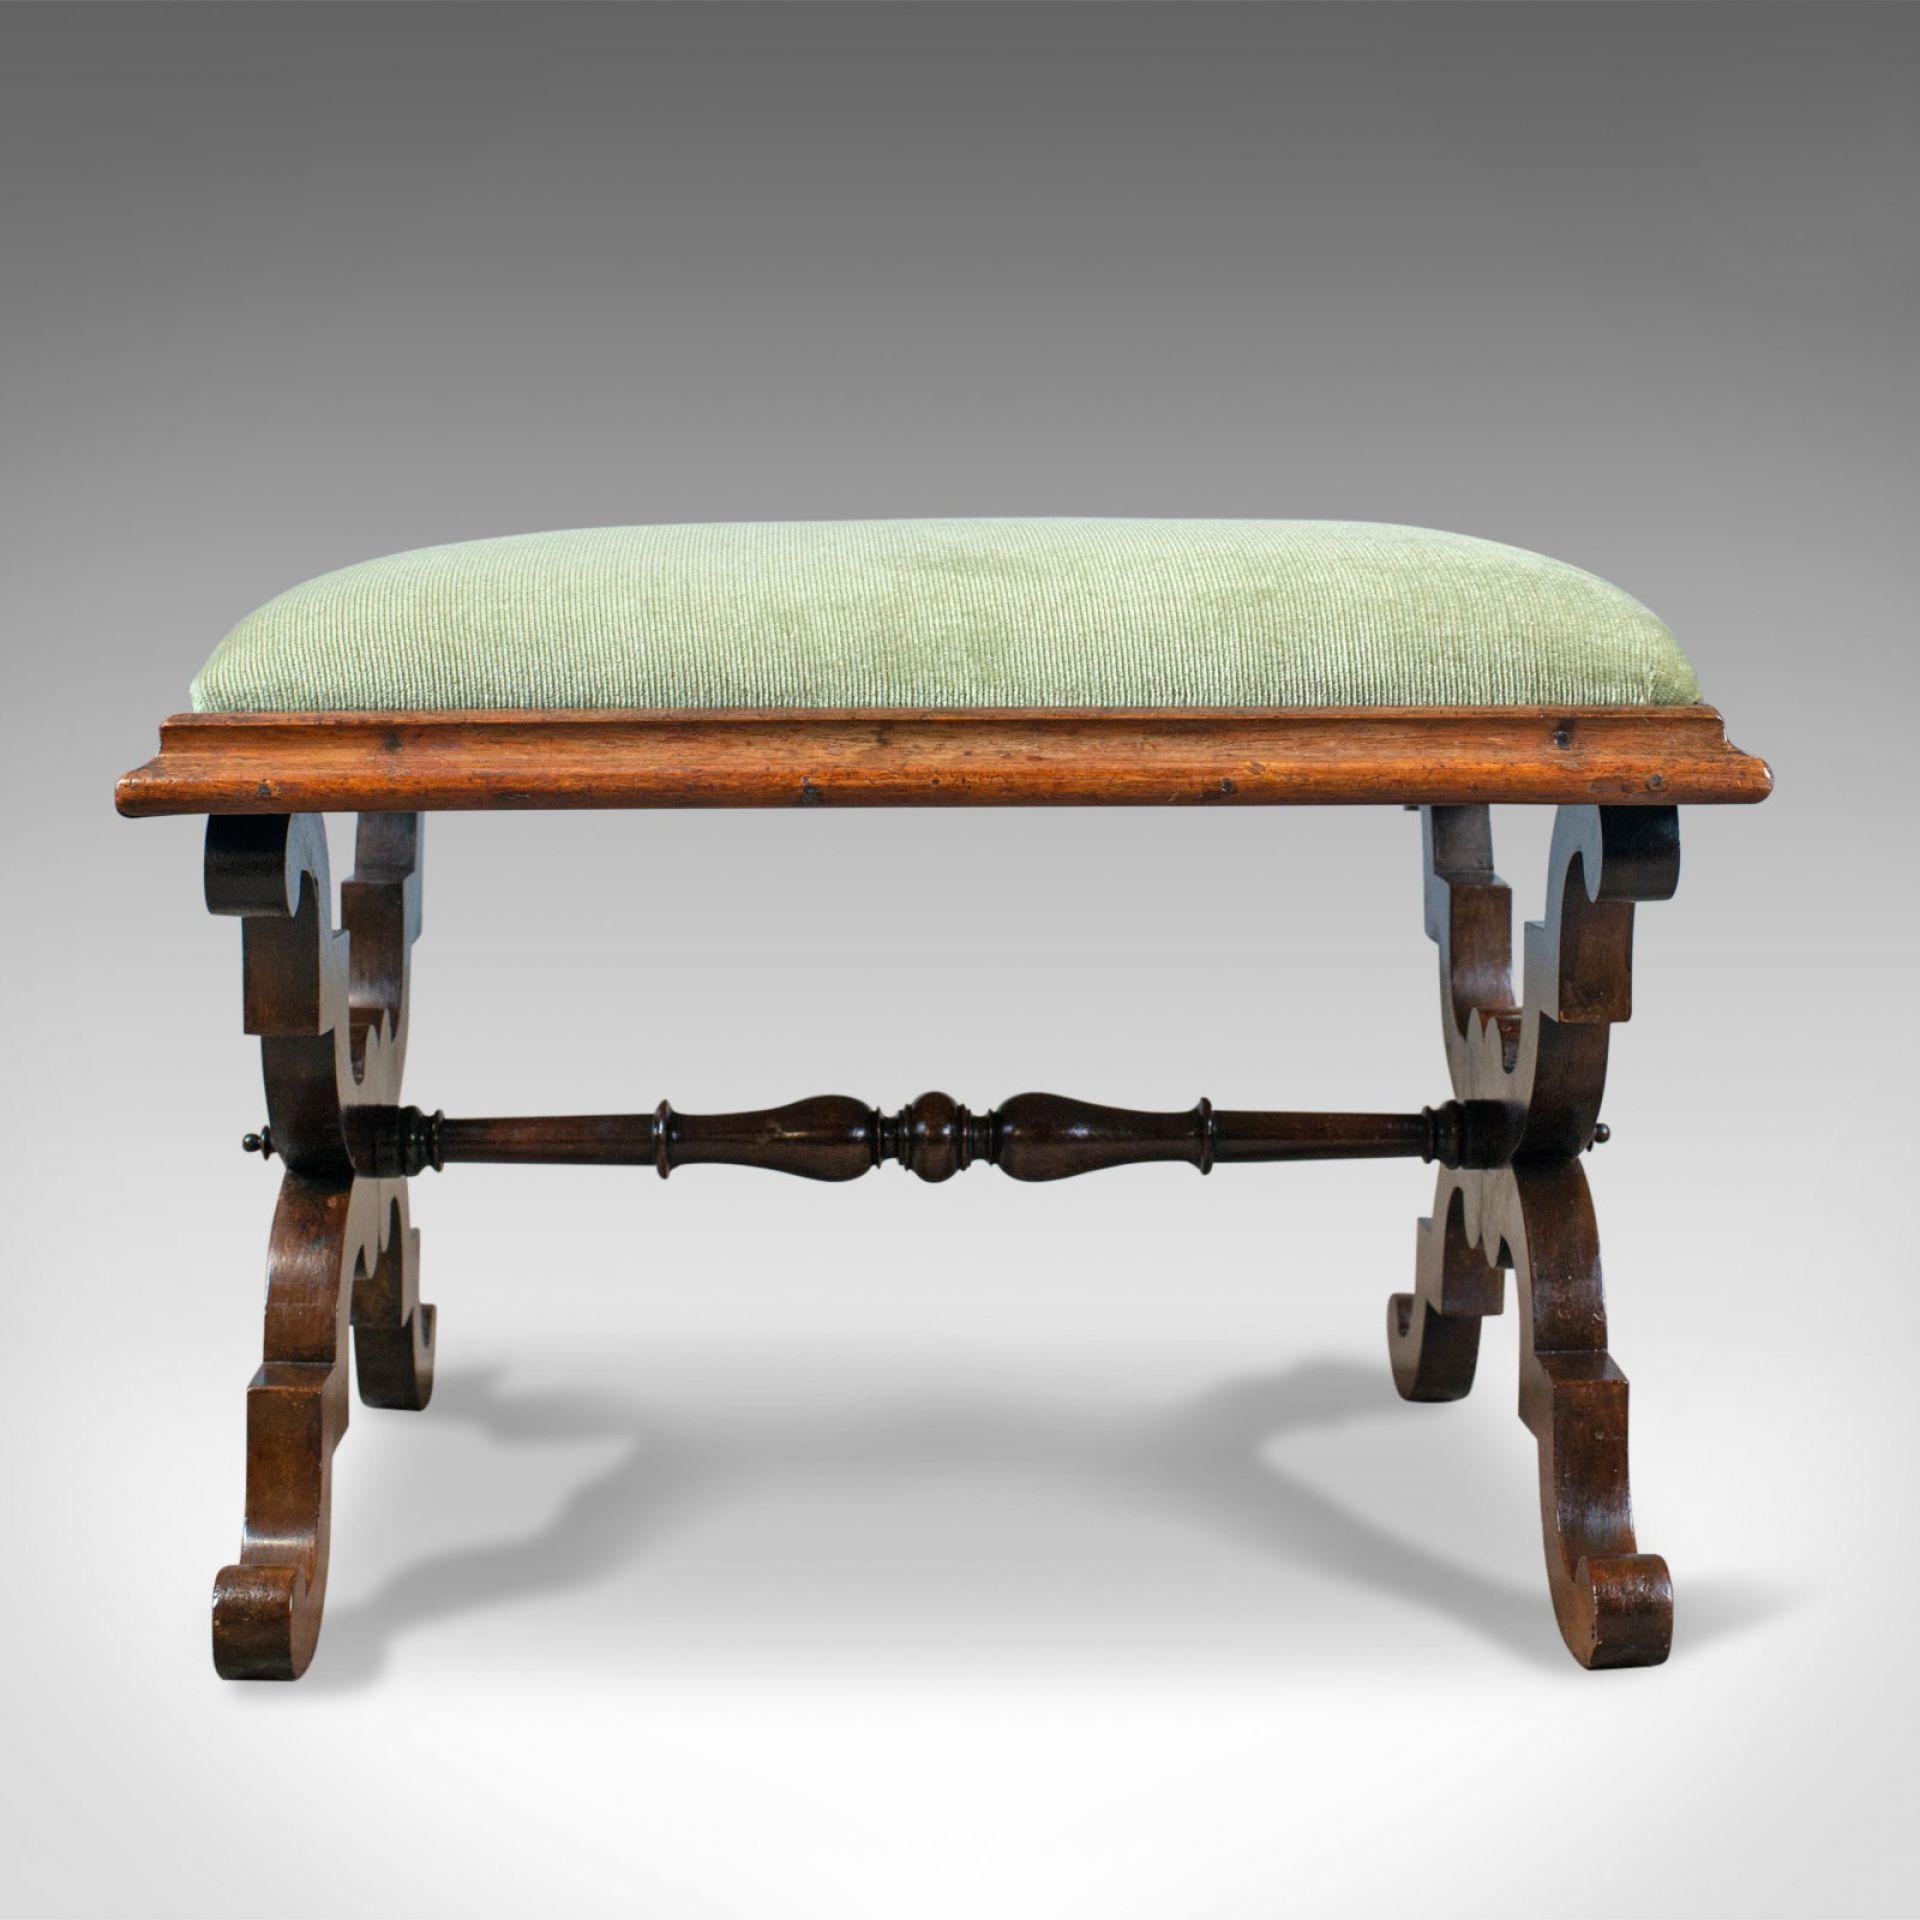 Antique Dressing Stool, Rosewood, Olive Green Cloth, English, Regency, c. 1820